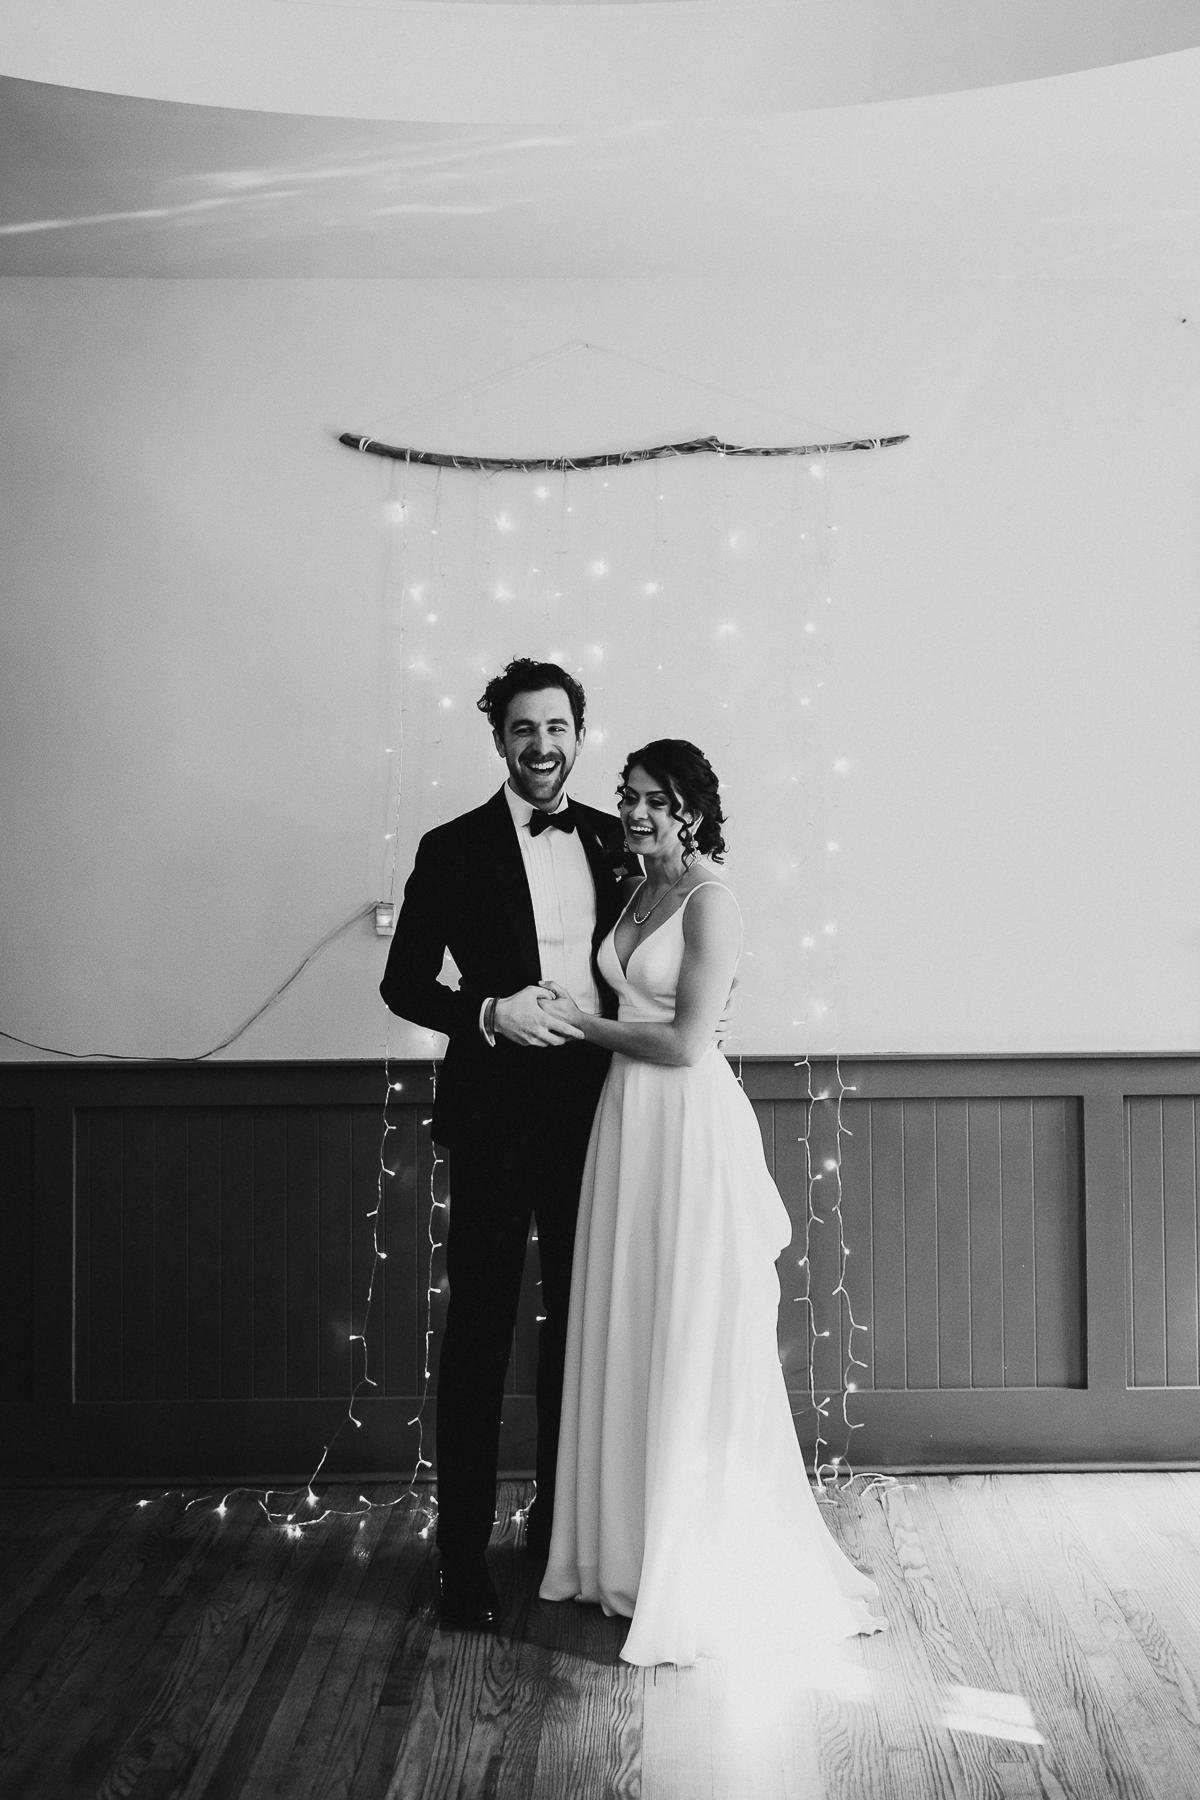 Humboldt-&-Jackson-Restaurant-Intimate-Brooklyn-Documentary-Wedding-Photographer-66.jpg